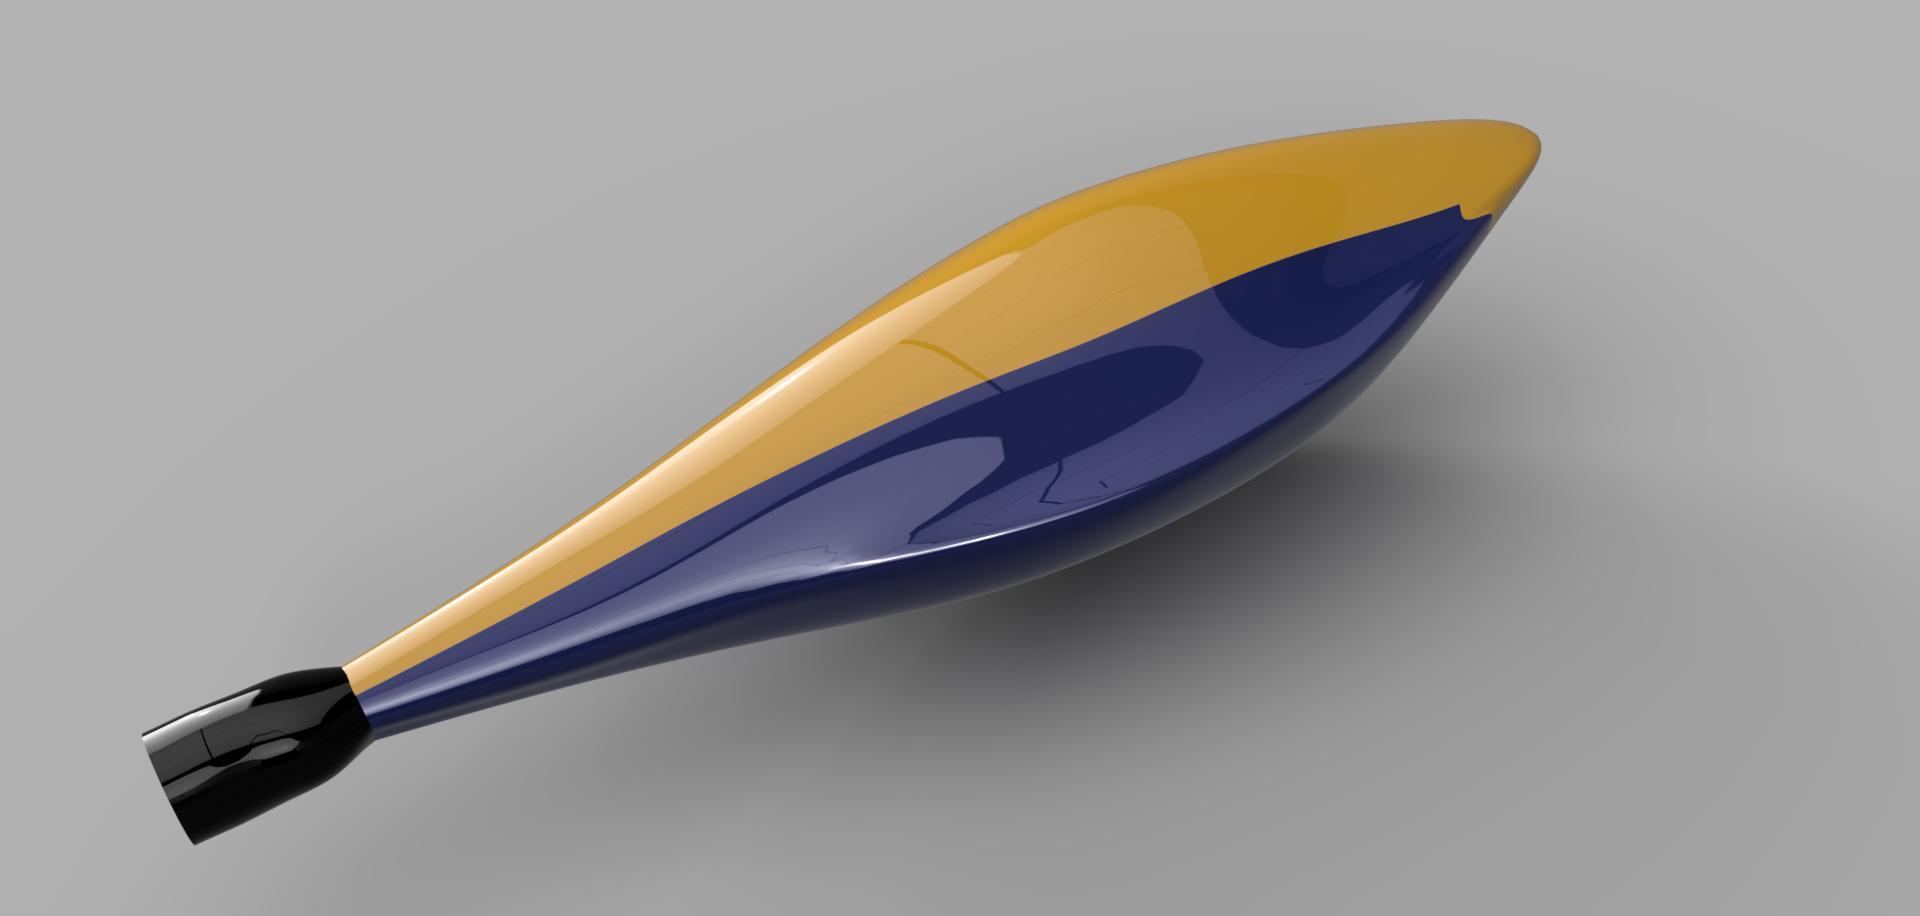 long beach invention clublong beach inventors forum underwater droneshoe shien box long beach invent